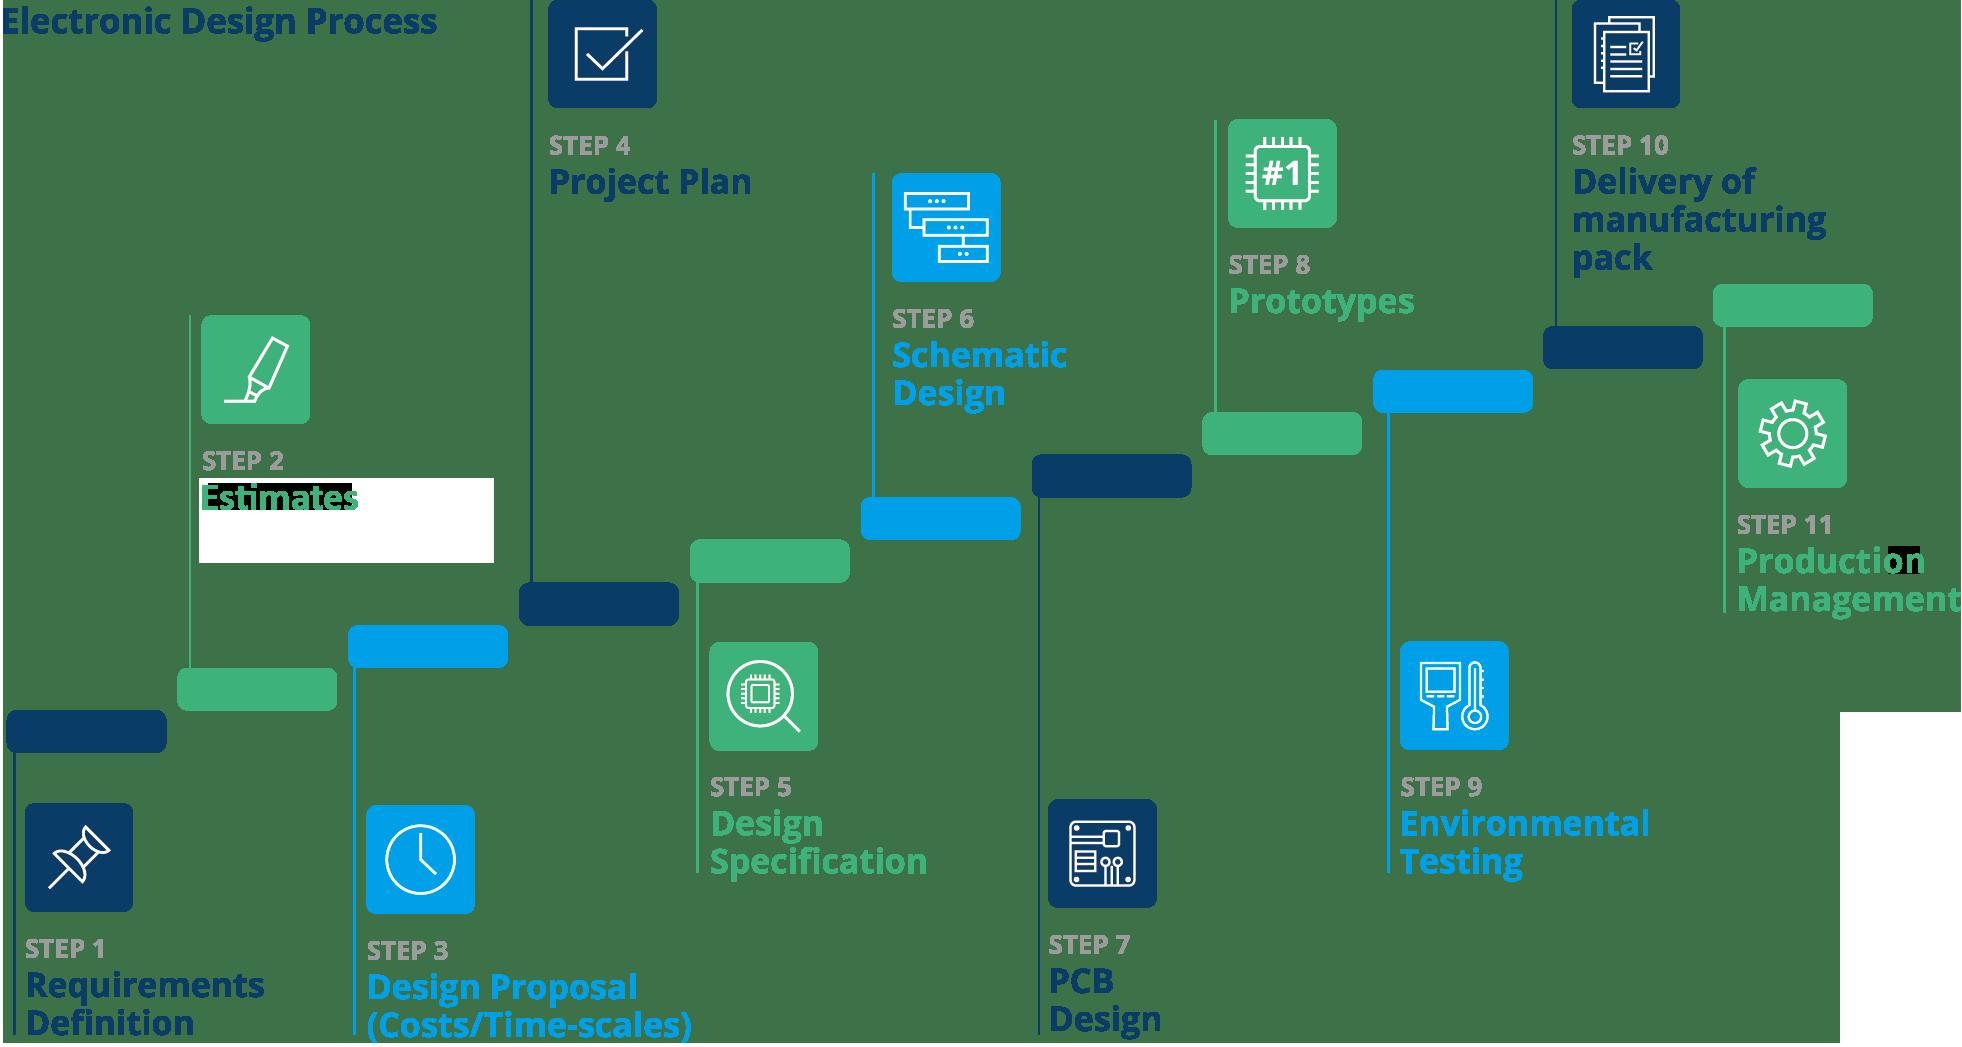 DSL-ElectronicDesignProcess